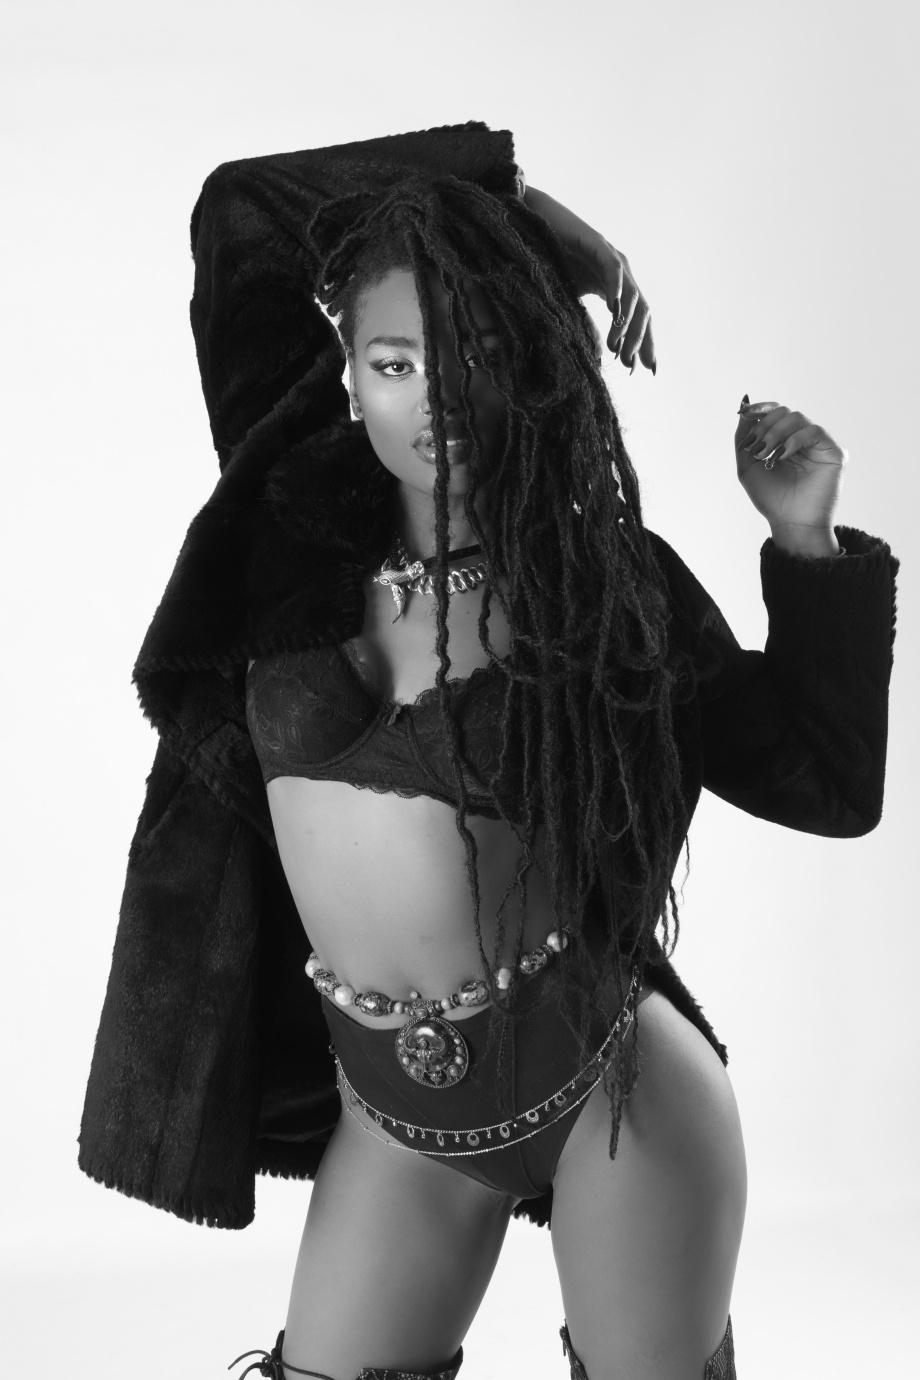 minnie marley, singer, soul, alternative, tattoos, glamour, studio, lingerie, black and white